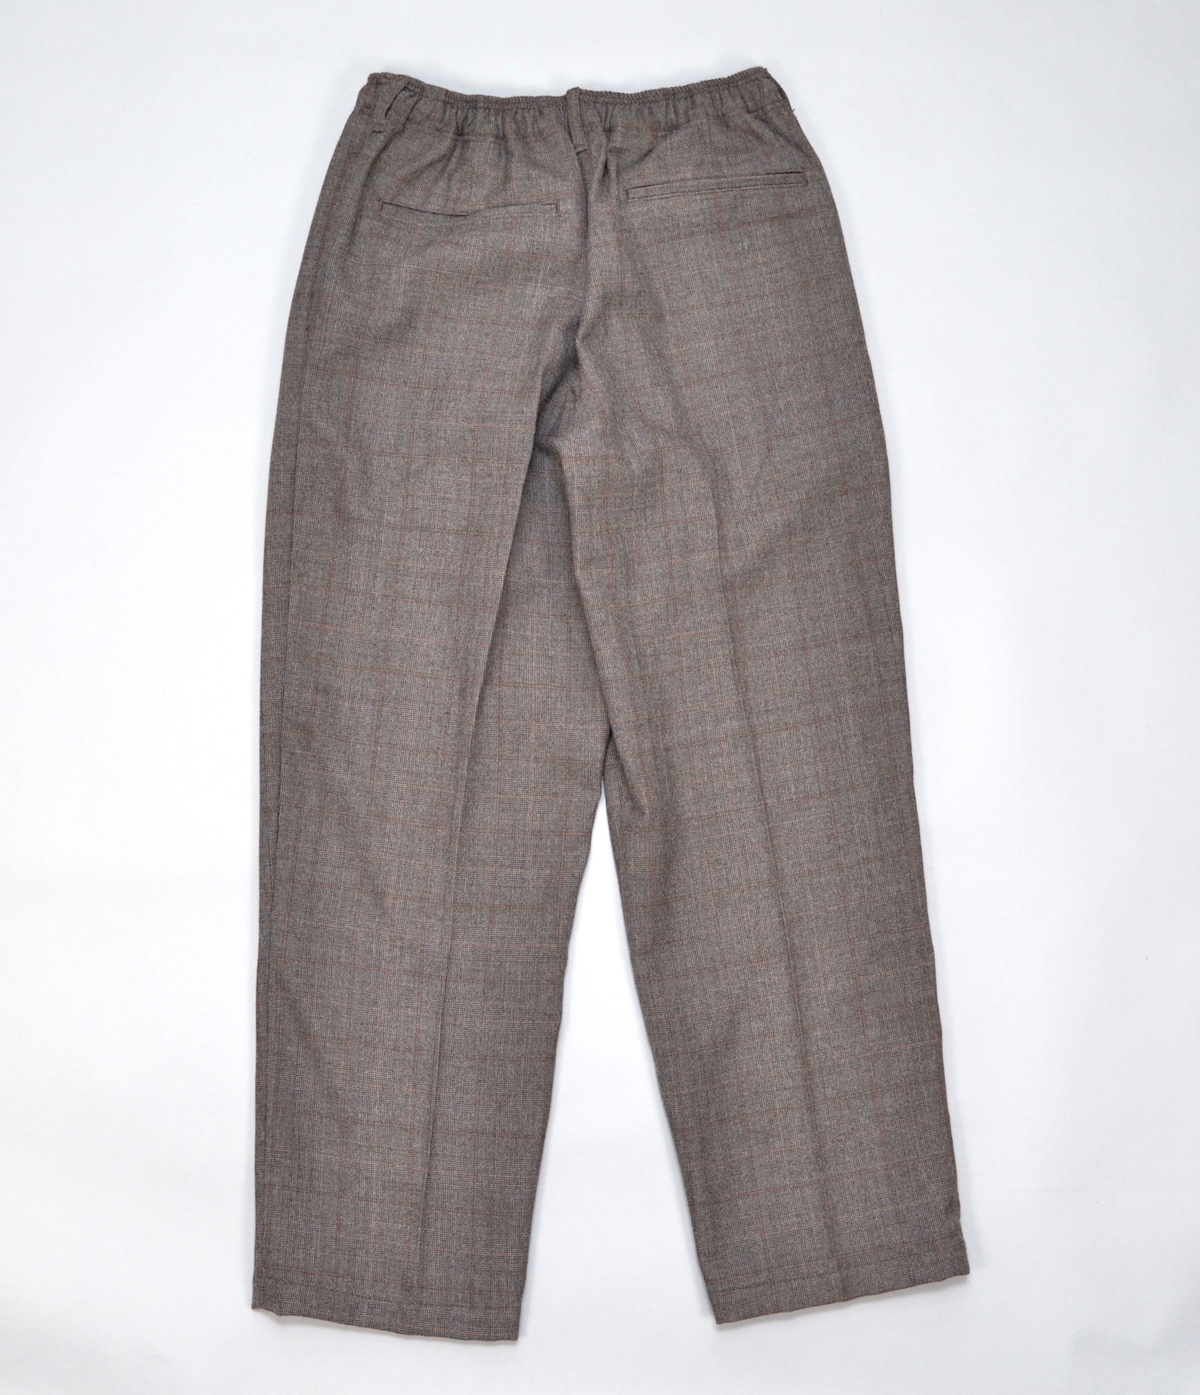 COMFORTABLE REASON「 Wool Glen Check Slacks / Brown 」